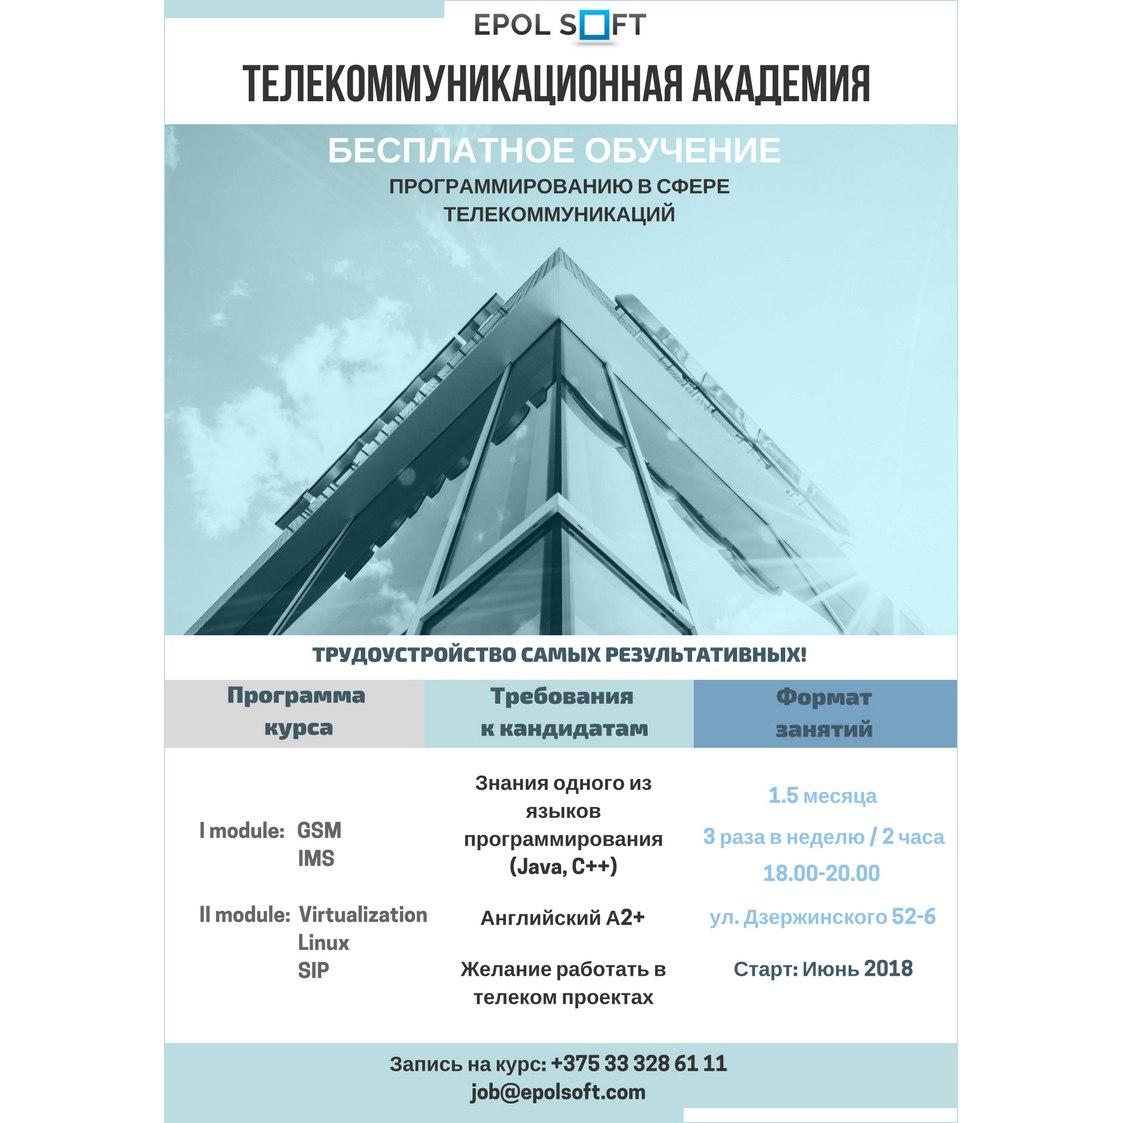 ТелеАкадемия